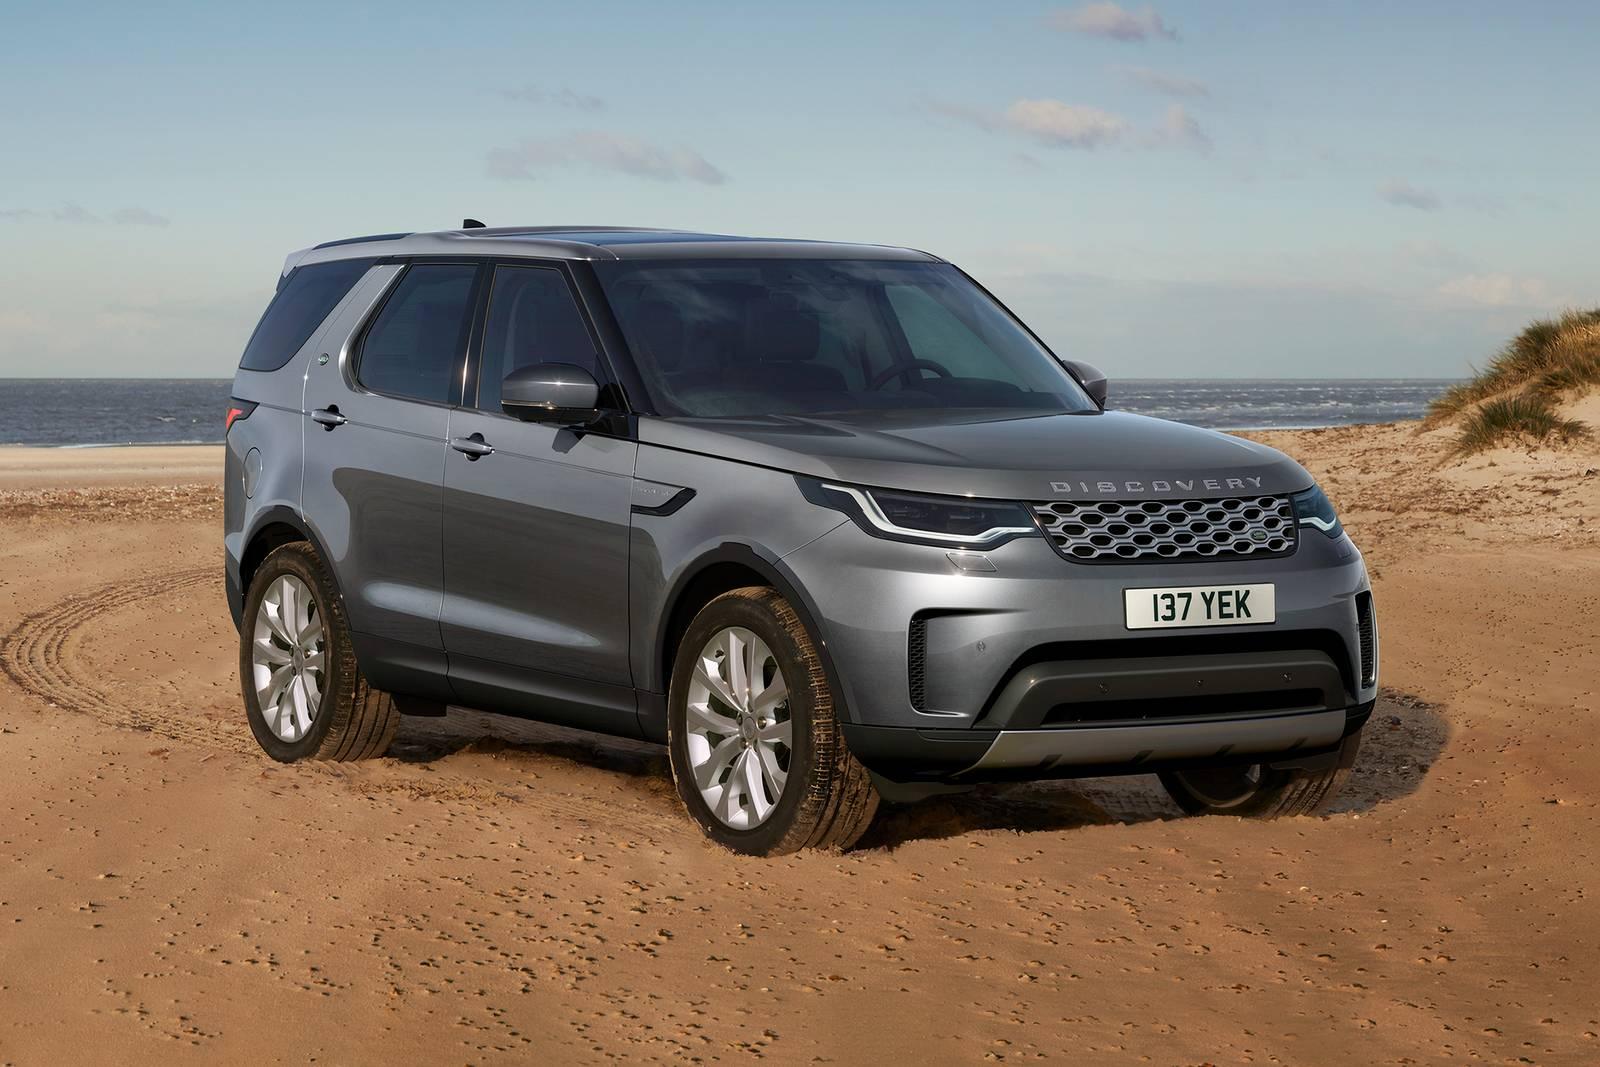 Jaguar Land Rover Australia re-affirms availability of petrol and diesel models